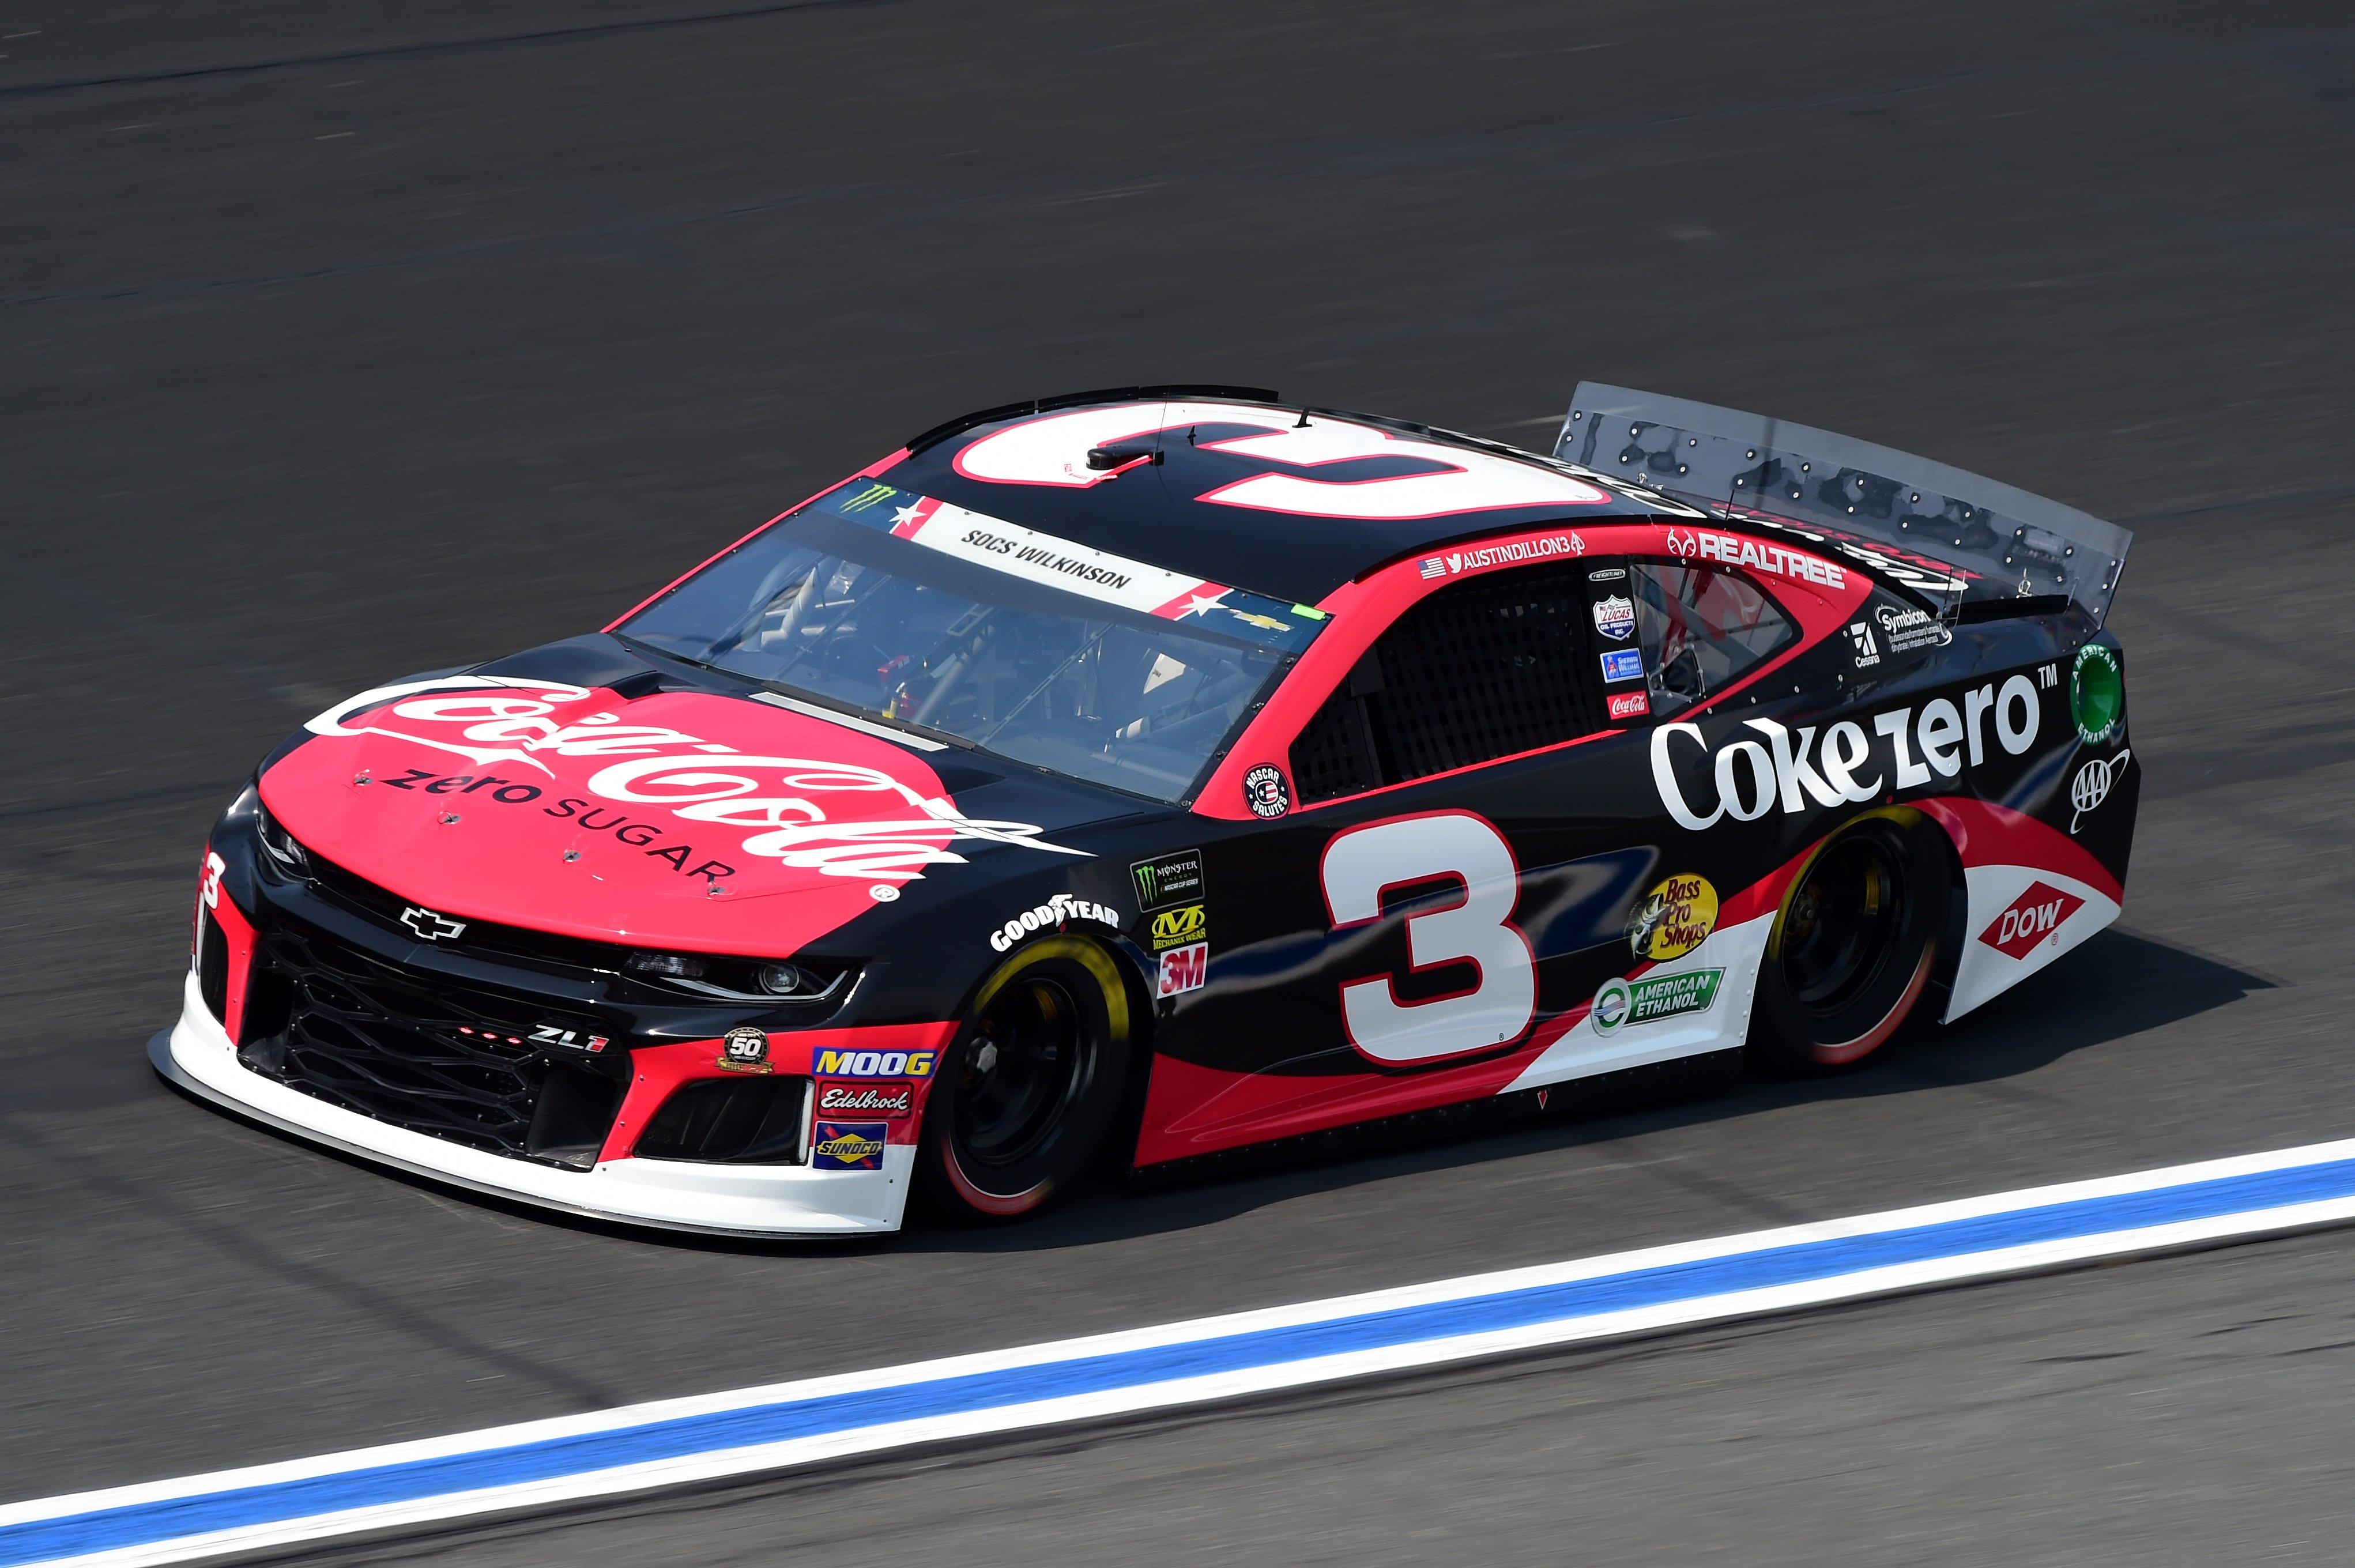 Coca-Cola 600: 10-lap average speeds (May 2019)